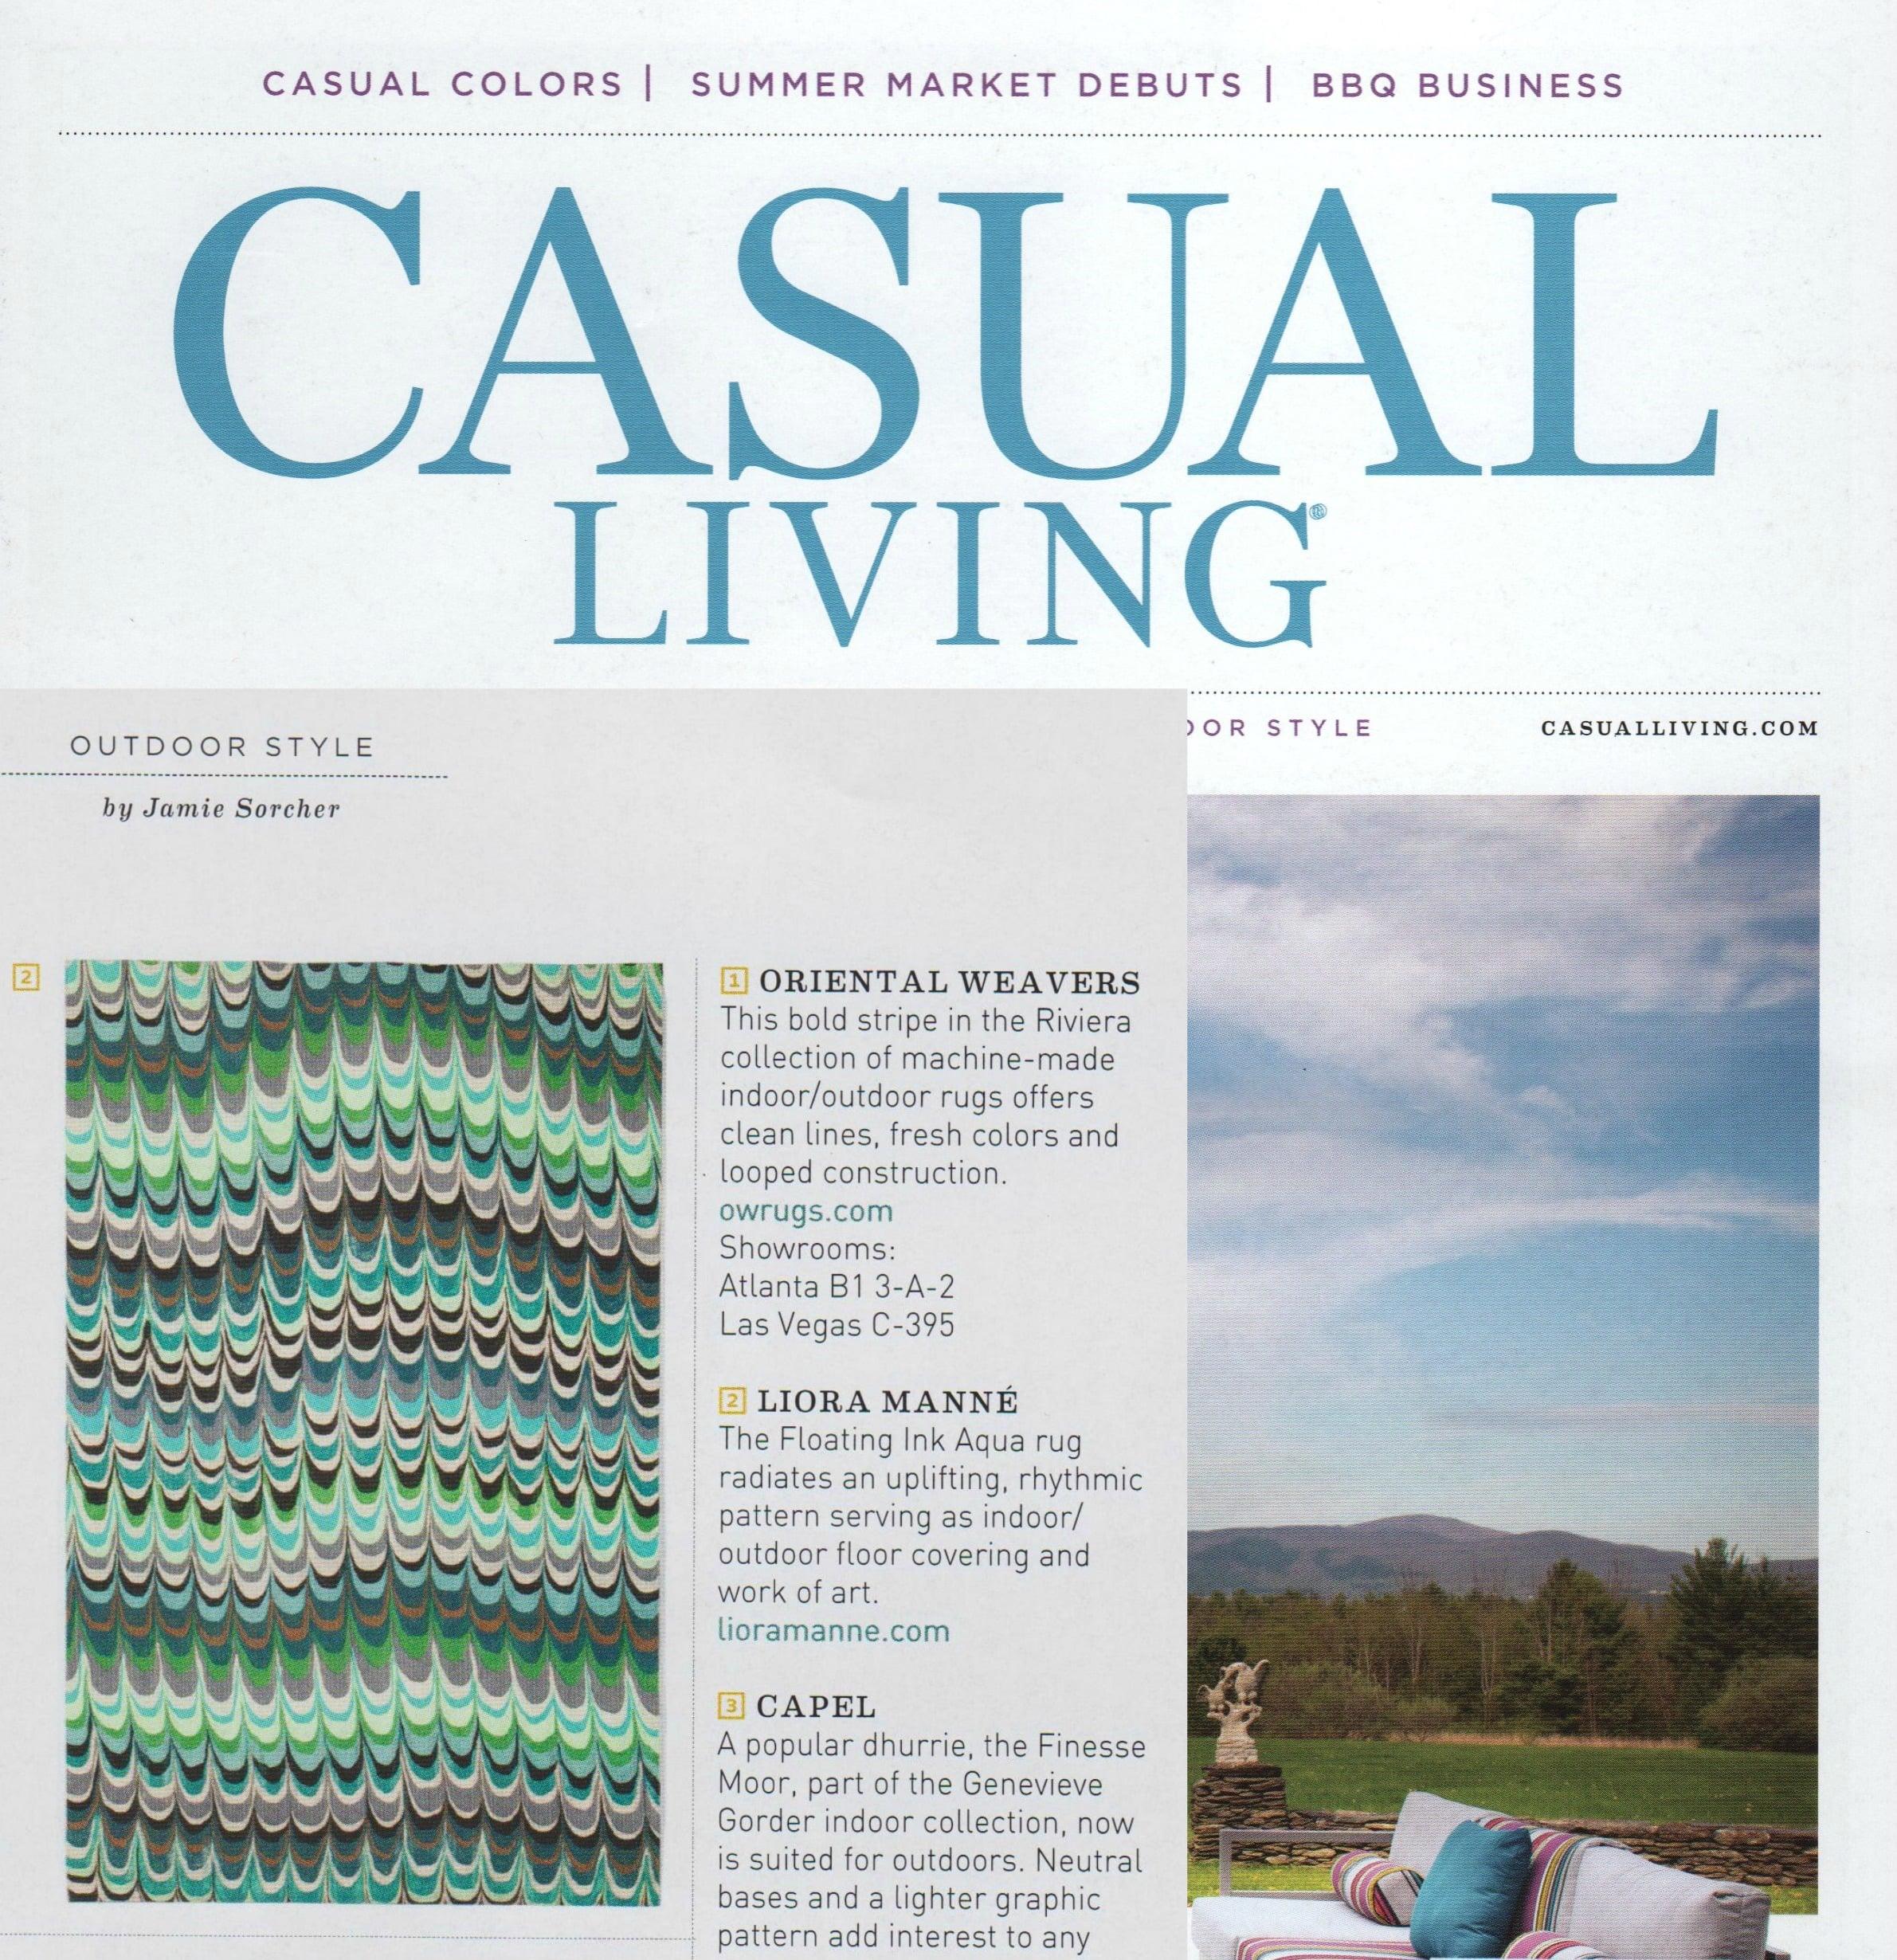 Casual Living Clip Final.jpg